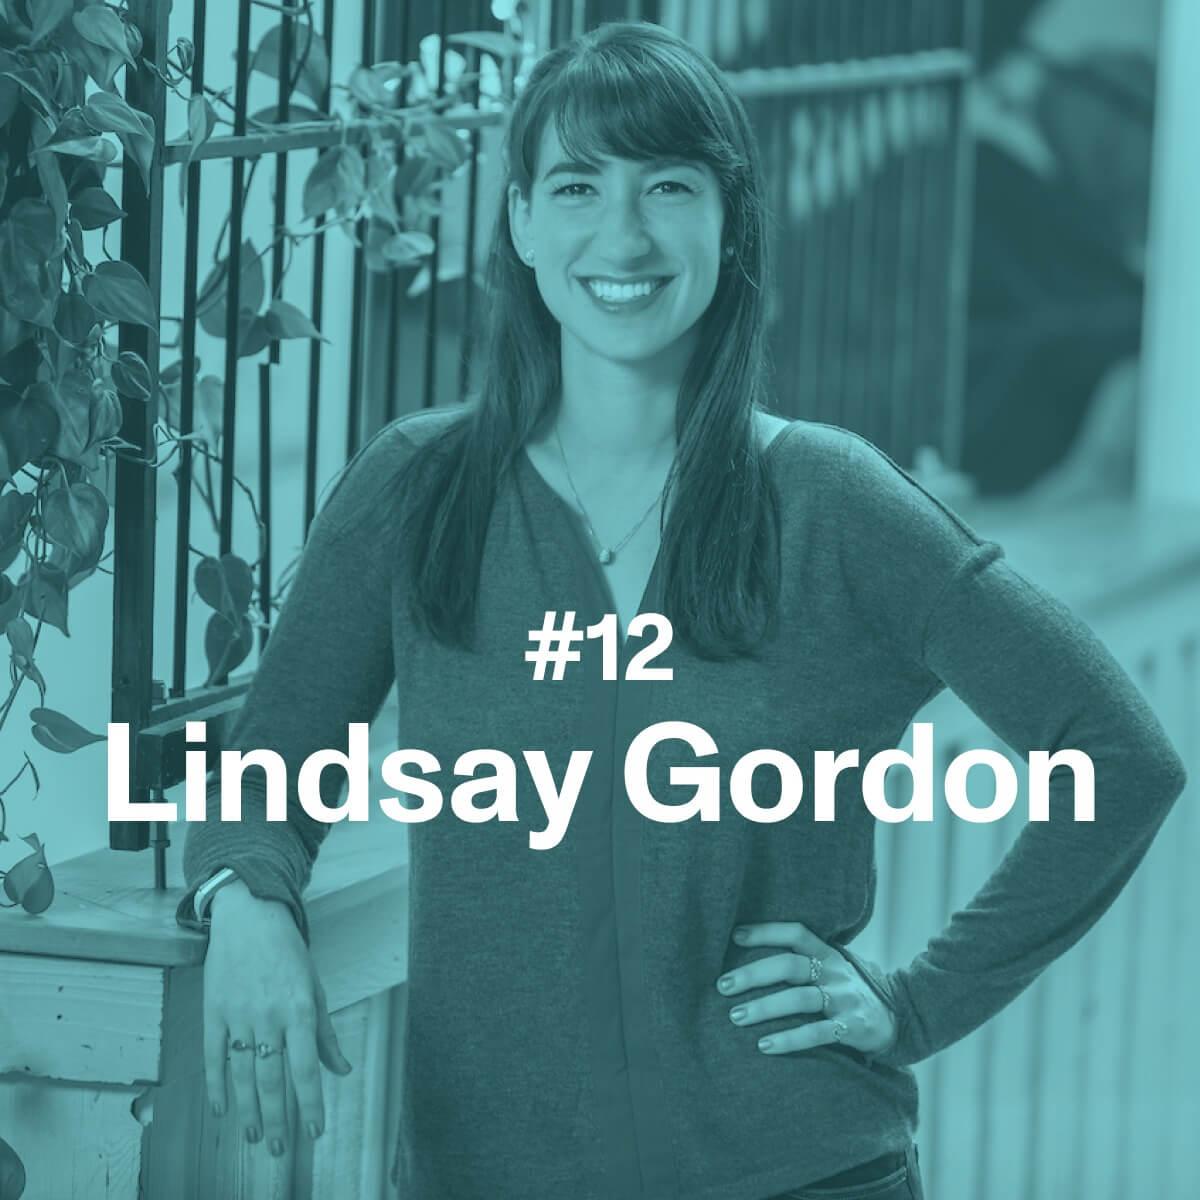 Career Alignment with Lindsay Gordon